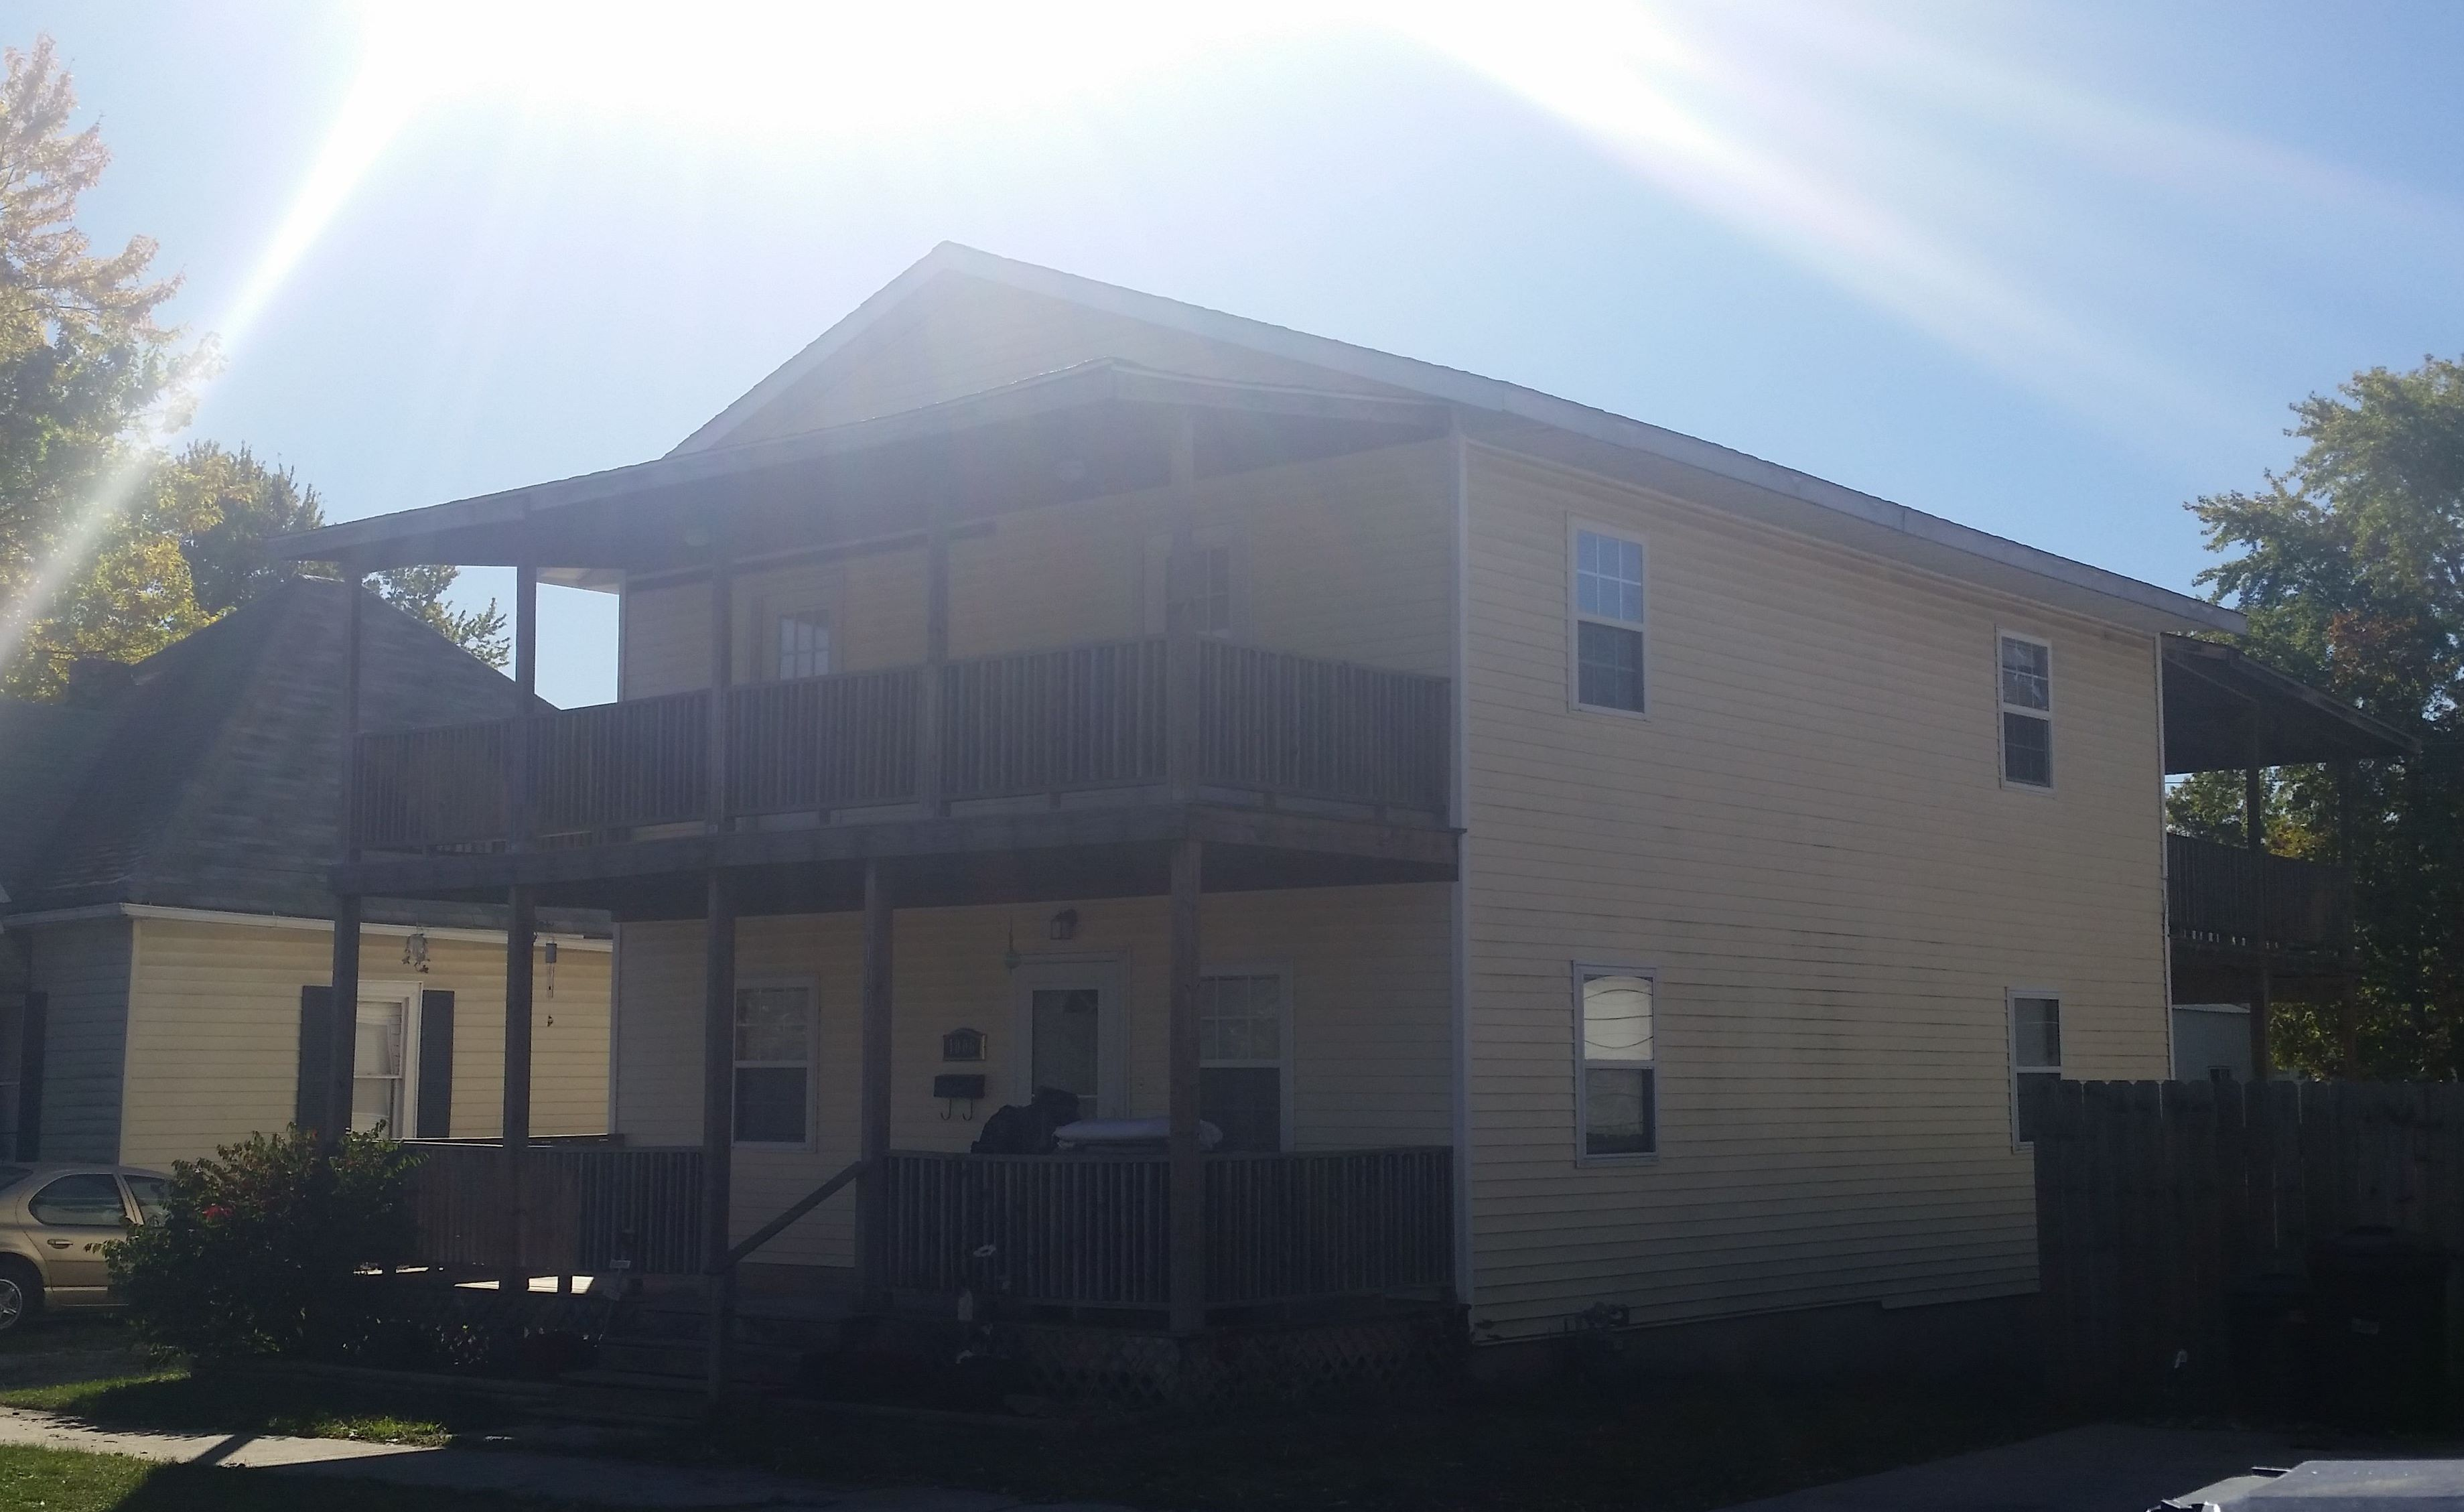 1006 Myra St, Moberly, Missouri 65270